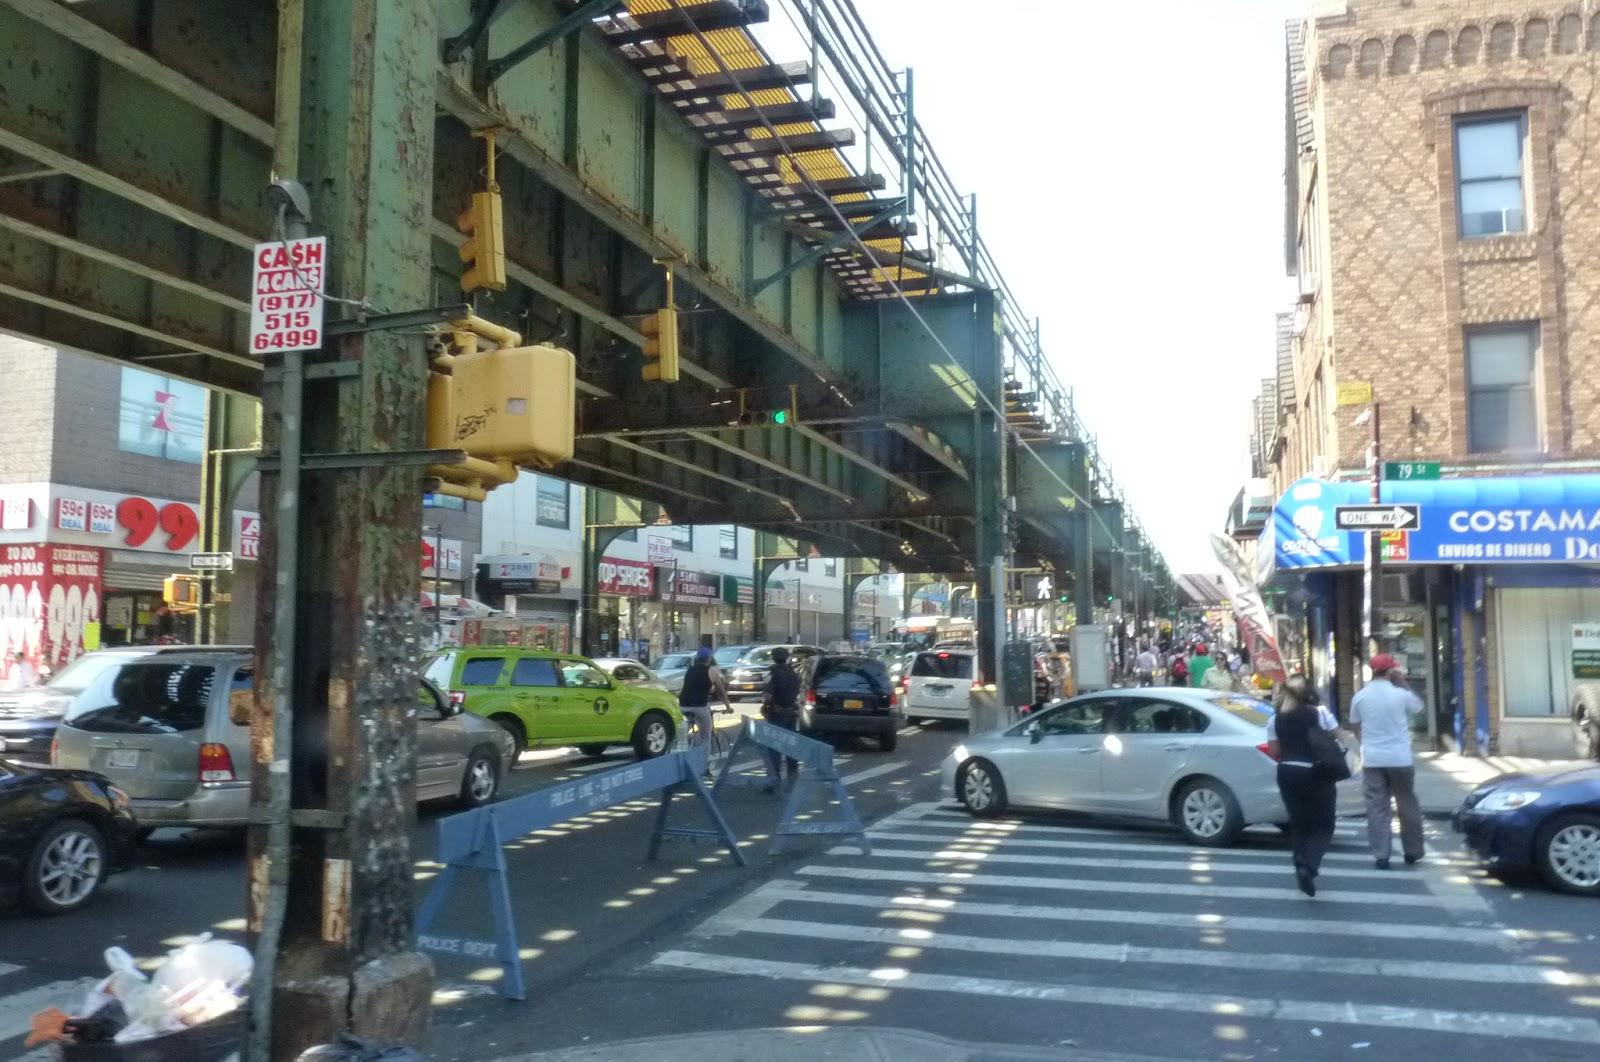 Bitácora de viaje: Bitácora de viaje. Día 3. New York